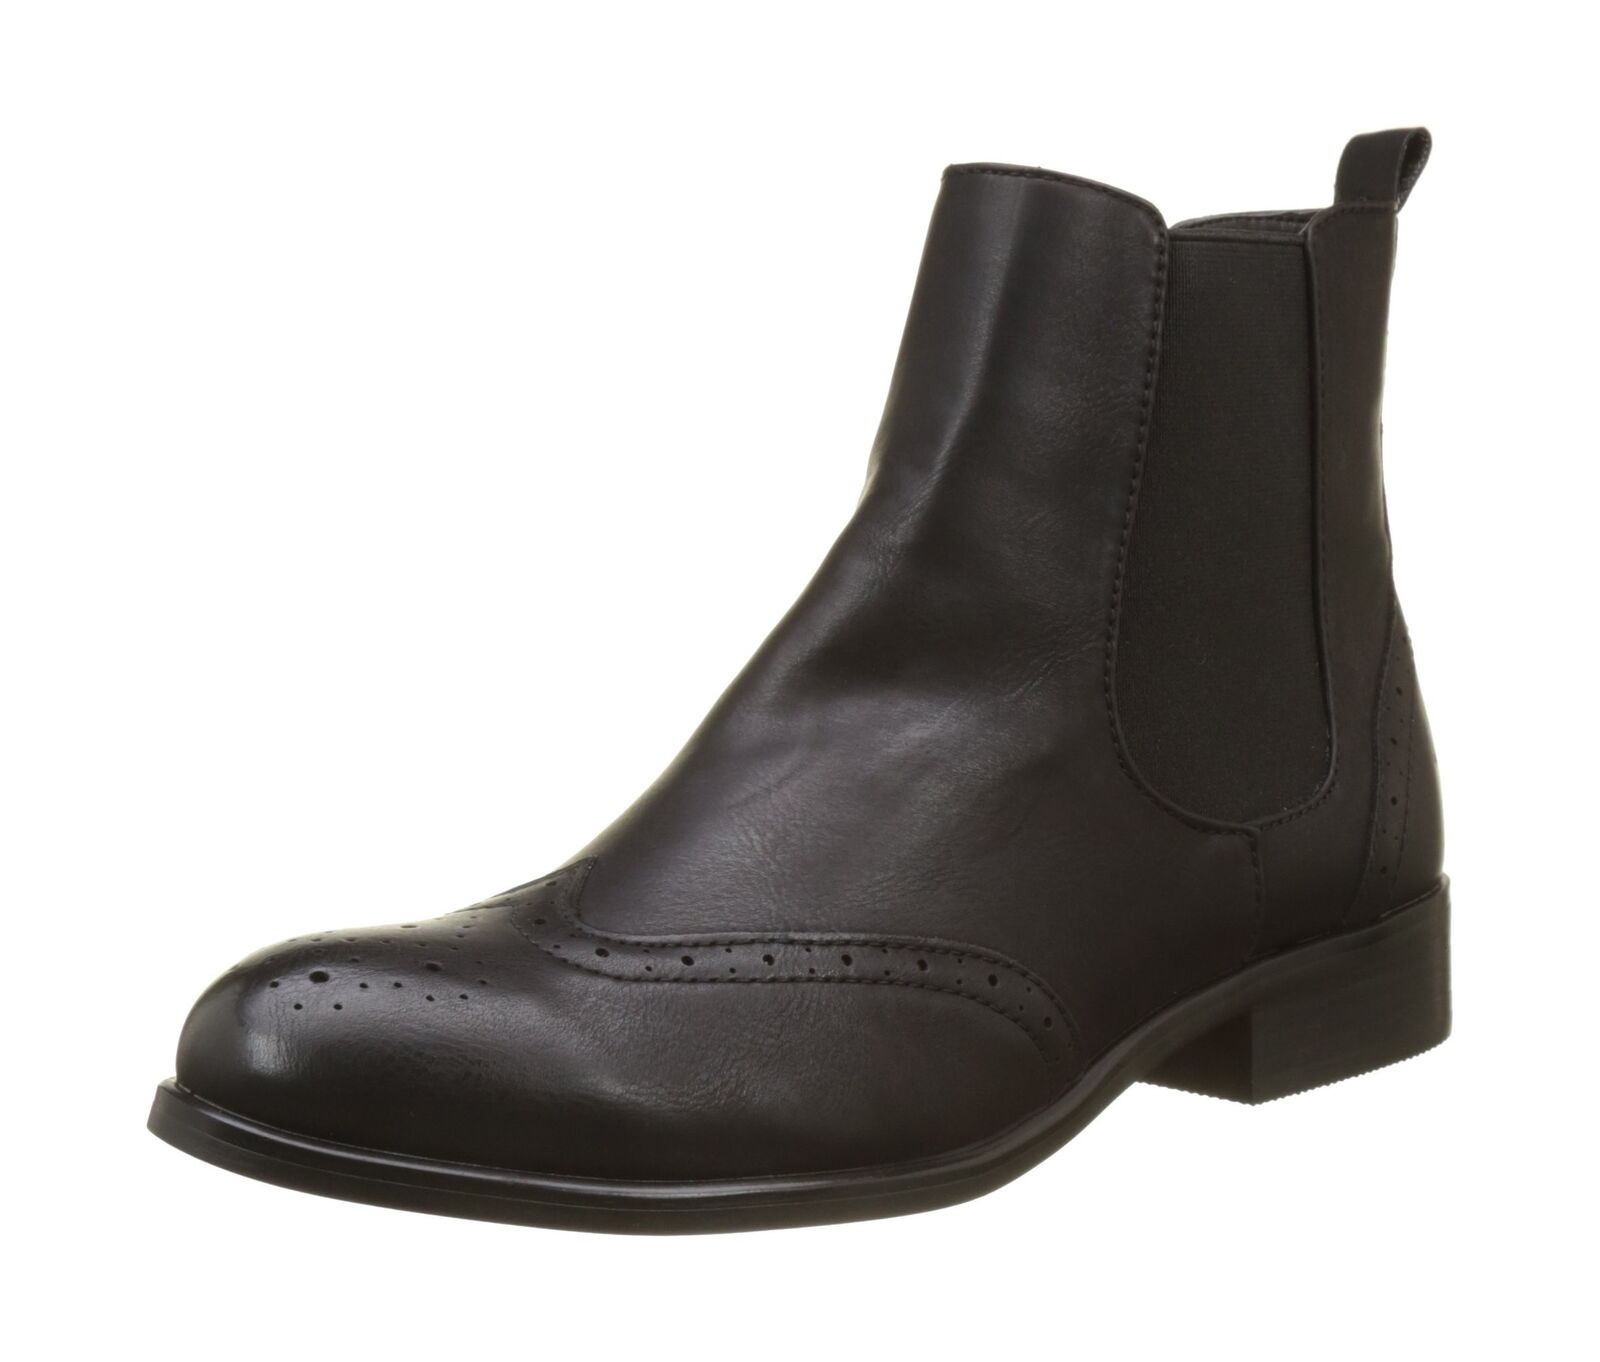 Buffalo Bottes B195a-61 B195a-61 B195a-61 P2173a Cuir Simili-Cuir Chelsea Bottes Noir (Noir 01) | Sale Online  4d2f19